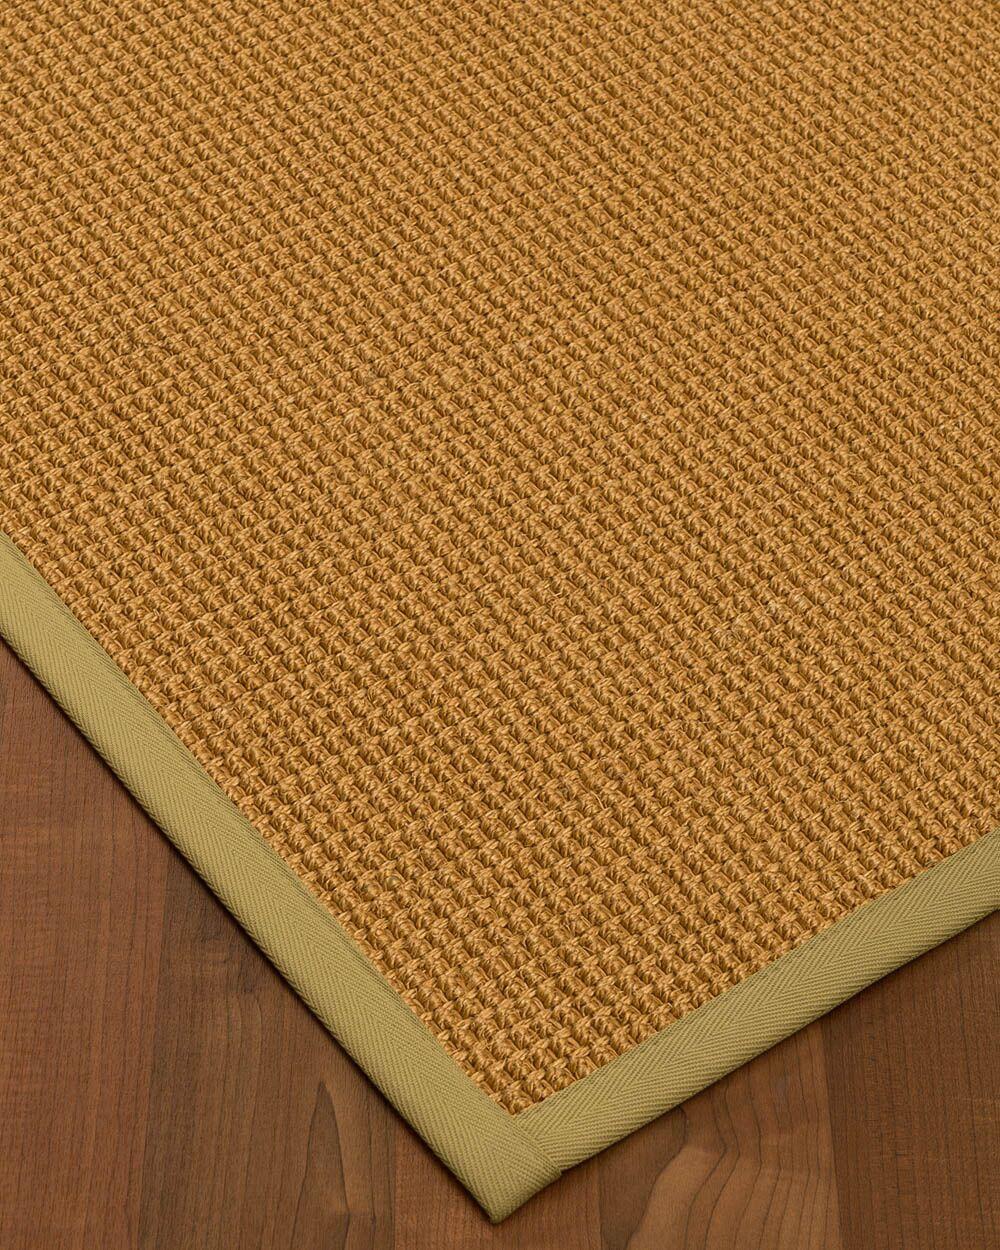 Aula Border Hand-Woven Brown/Sand Area Rug Rug Pad Included: No, Rug Size: Rectangle 3' x 5'